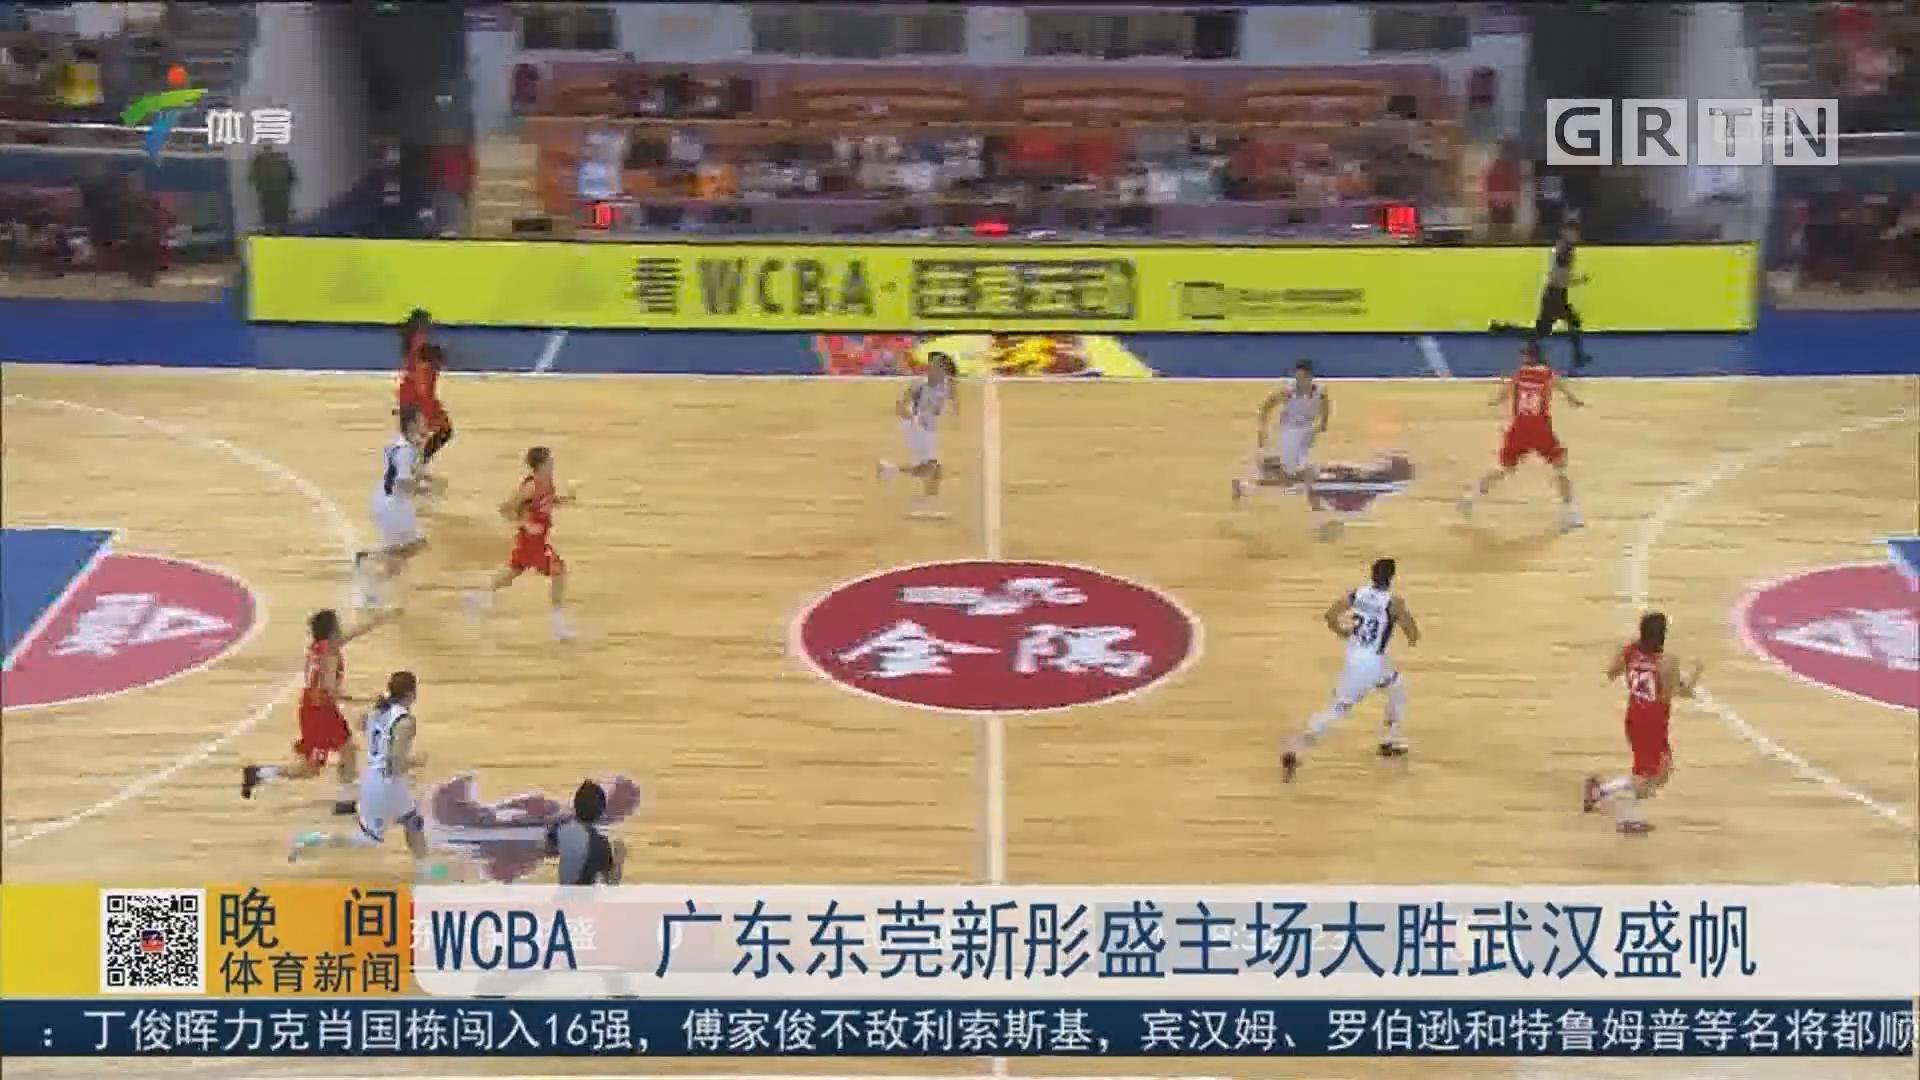 WCBA 广东东莞新彤盛主场大胜武汉盛帆